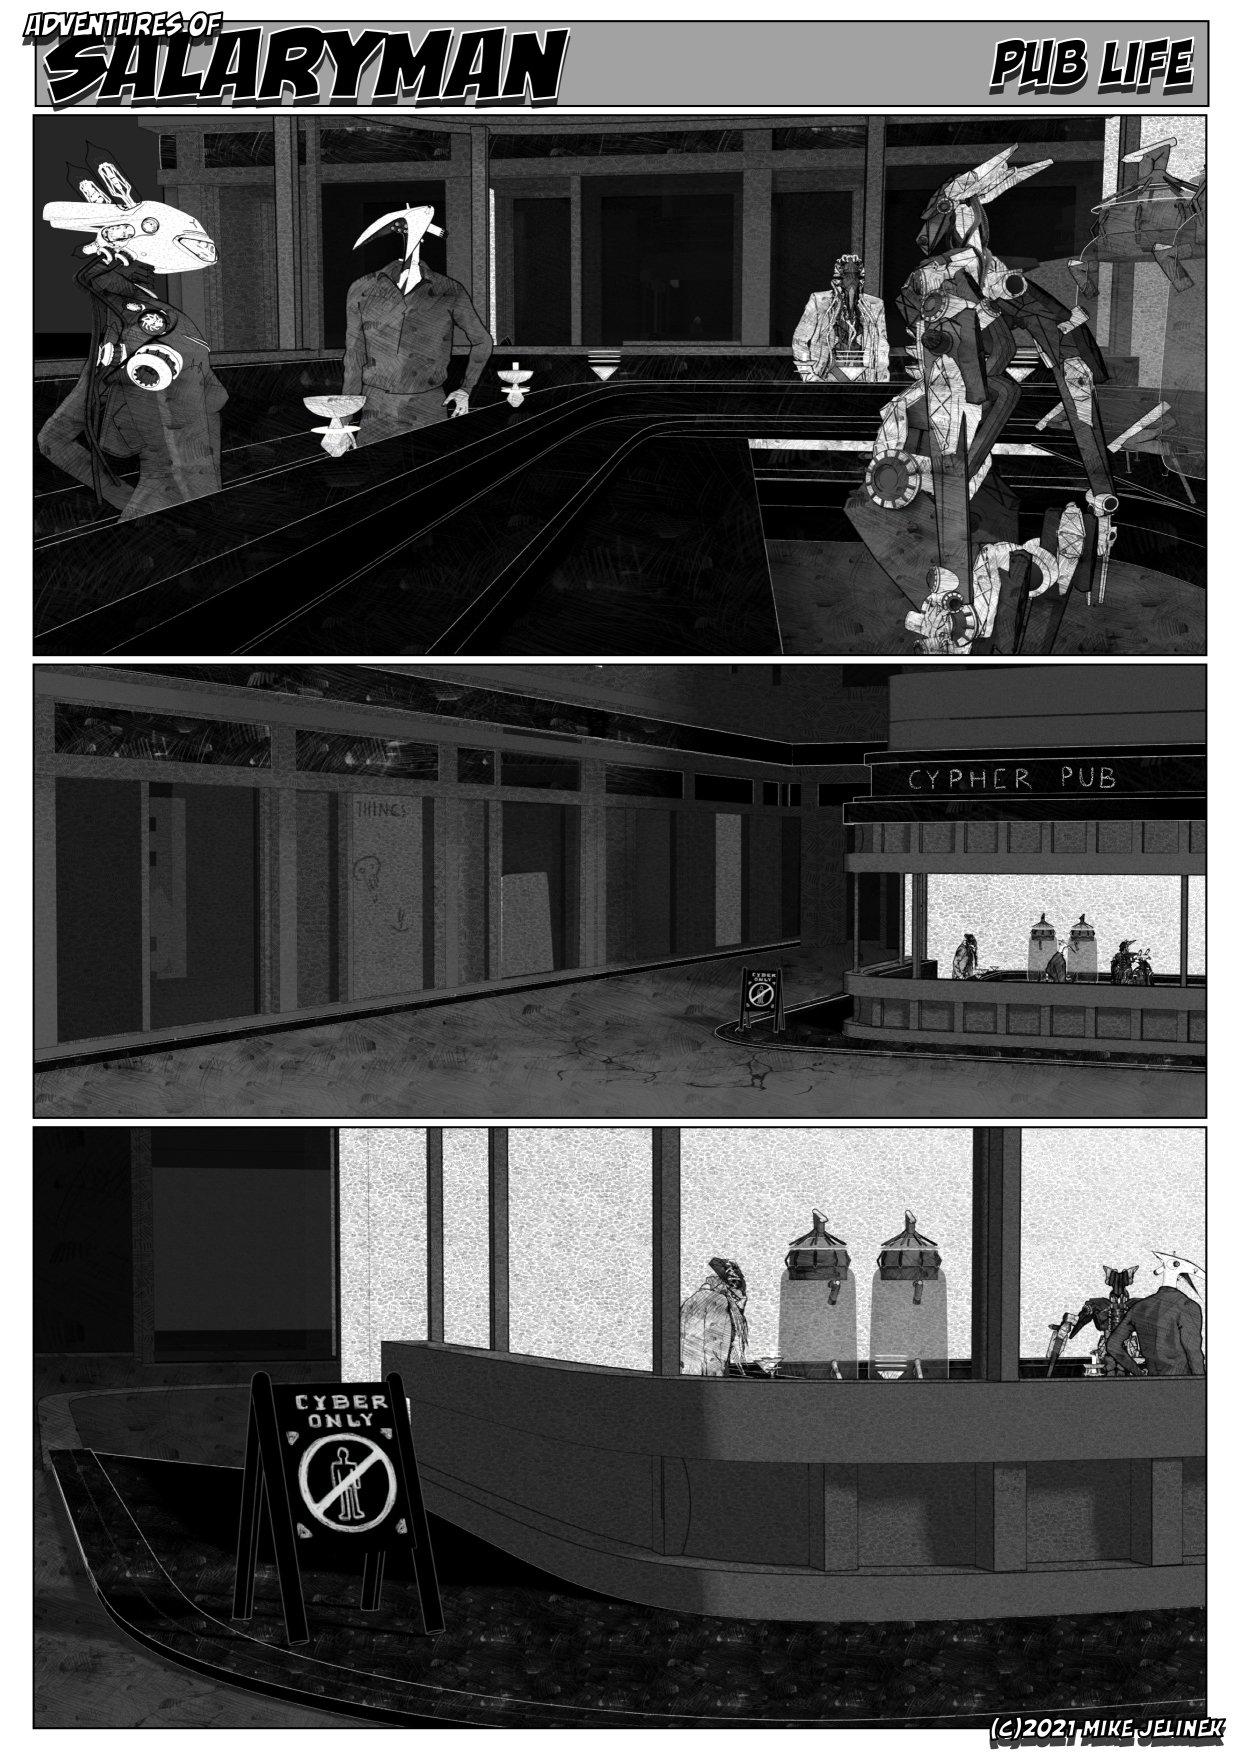 mike-jelinek-salrayman-keyshot-3d-rendering-00